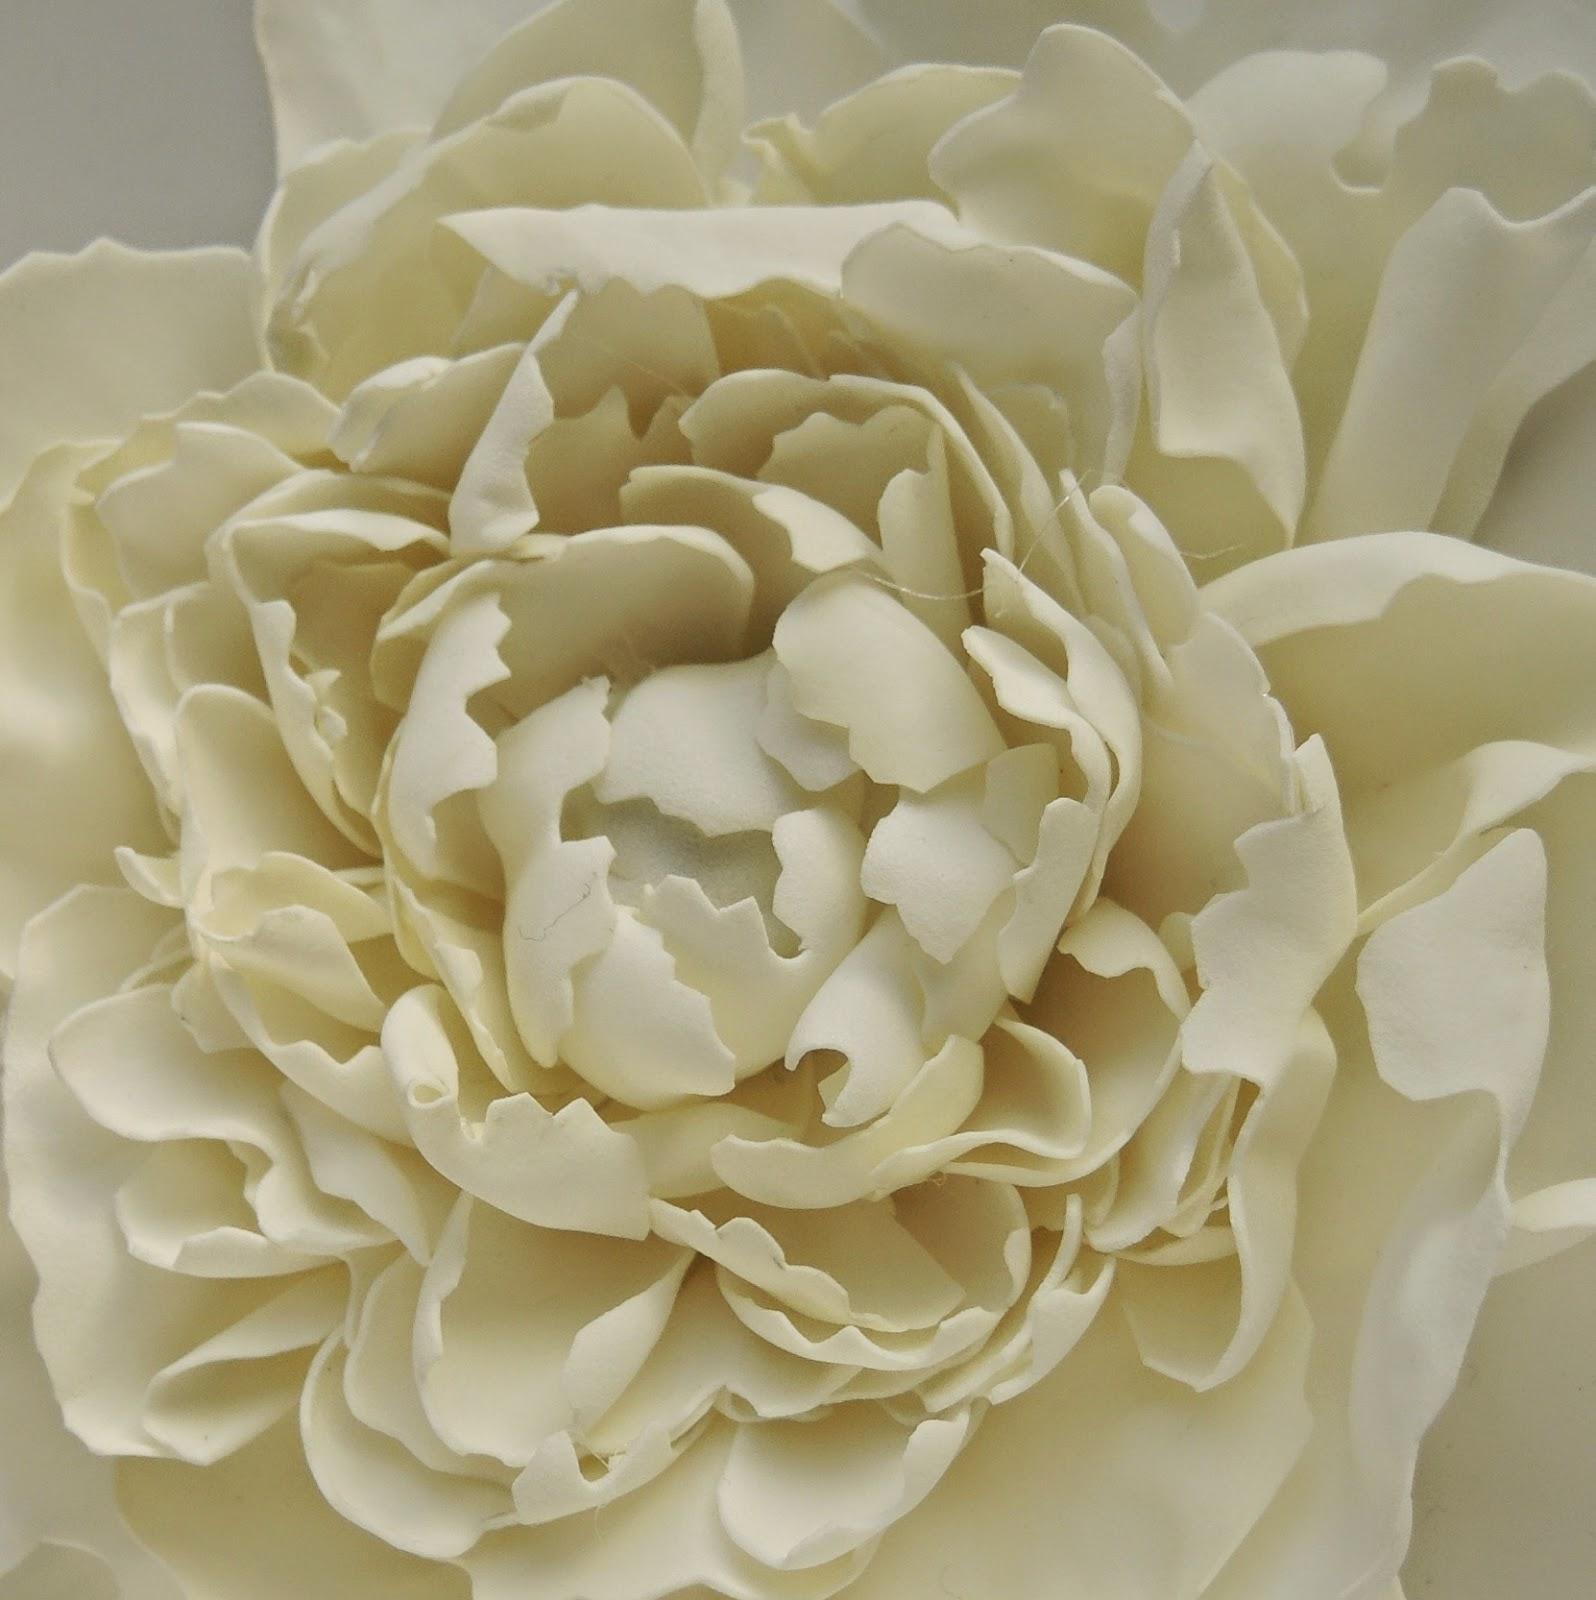 foameran.jpg, pion, cvetok, flower, floret, brooch, pin, peony,  фоамеран, цветы из фоамерана, цветок из фоамерана, изделие из фоамерана, цветы из фома, цветок из фома, выкройка, своими руками, цветы своими руками, пион, брошь, брошка, брошь цветок, брошка из фоамерана, сделать брошь